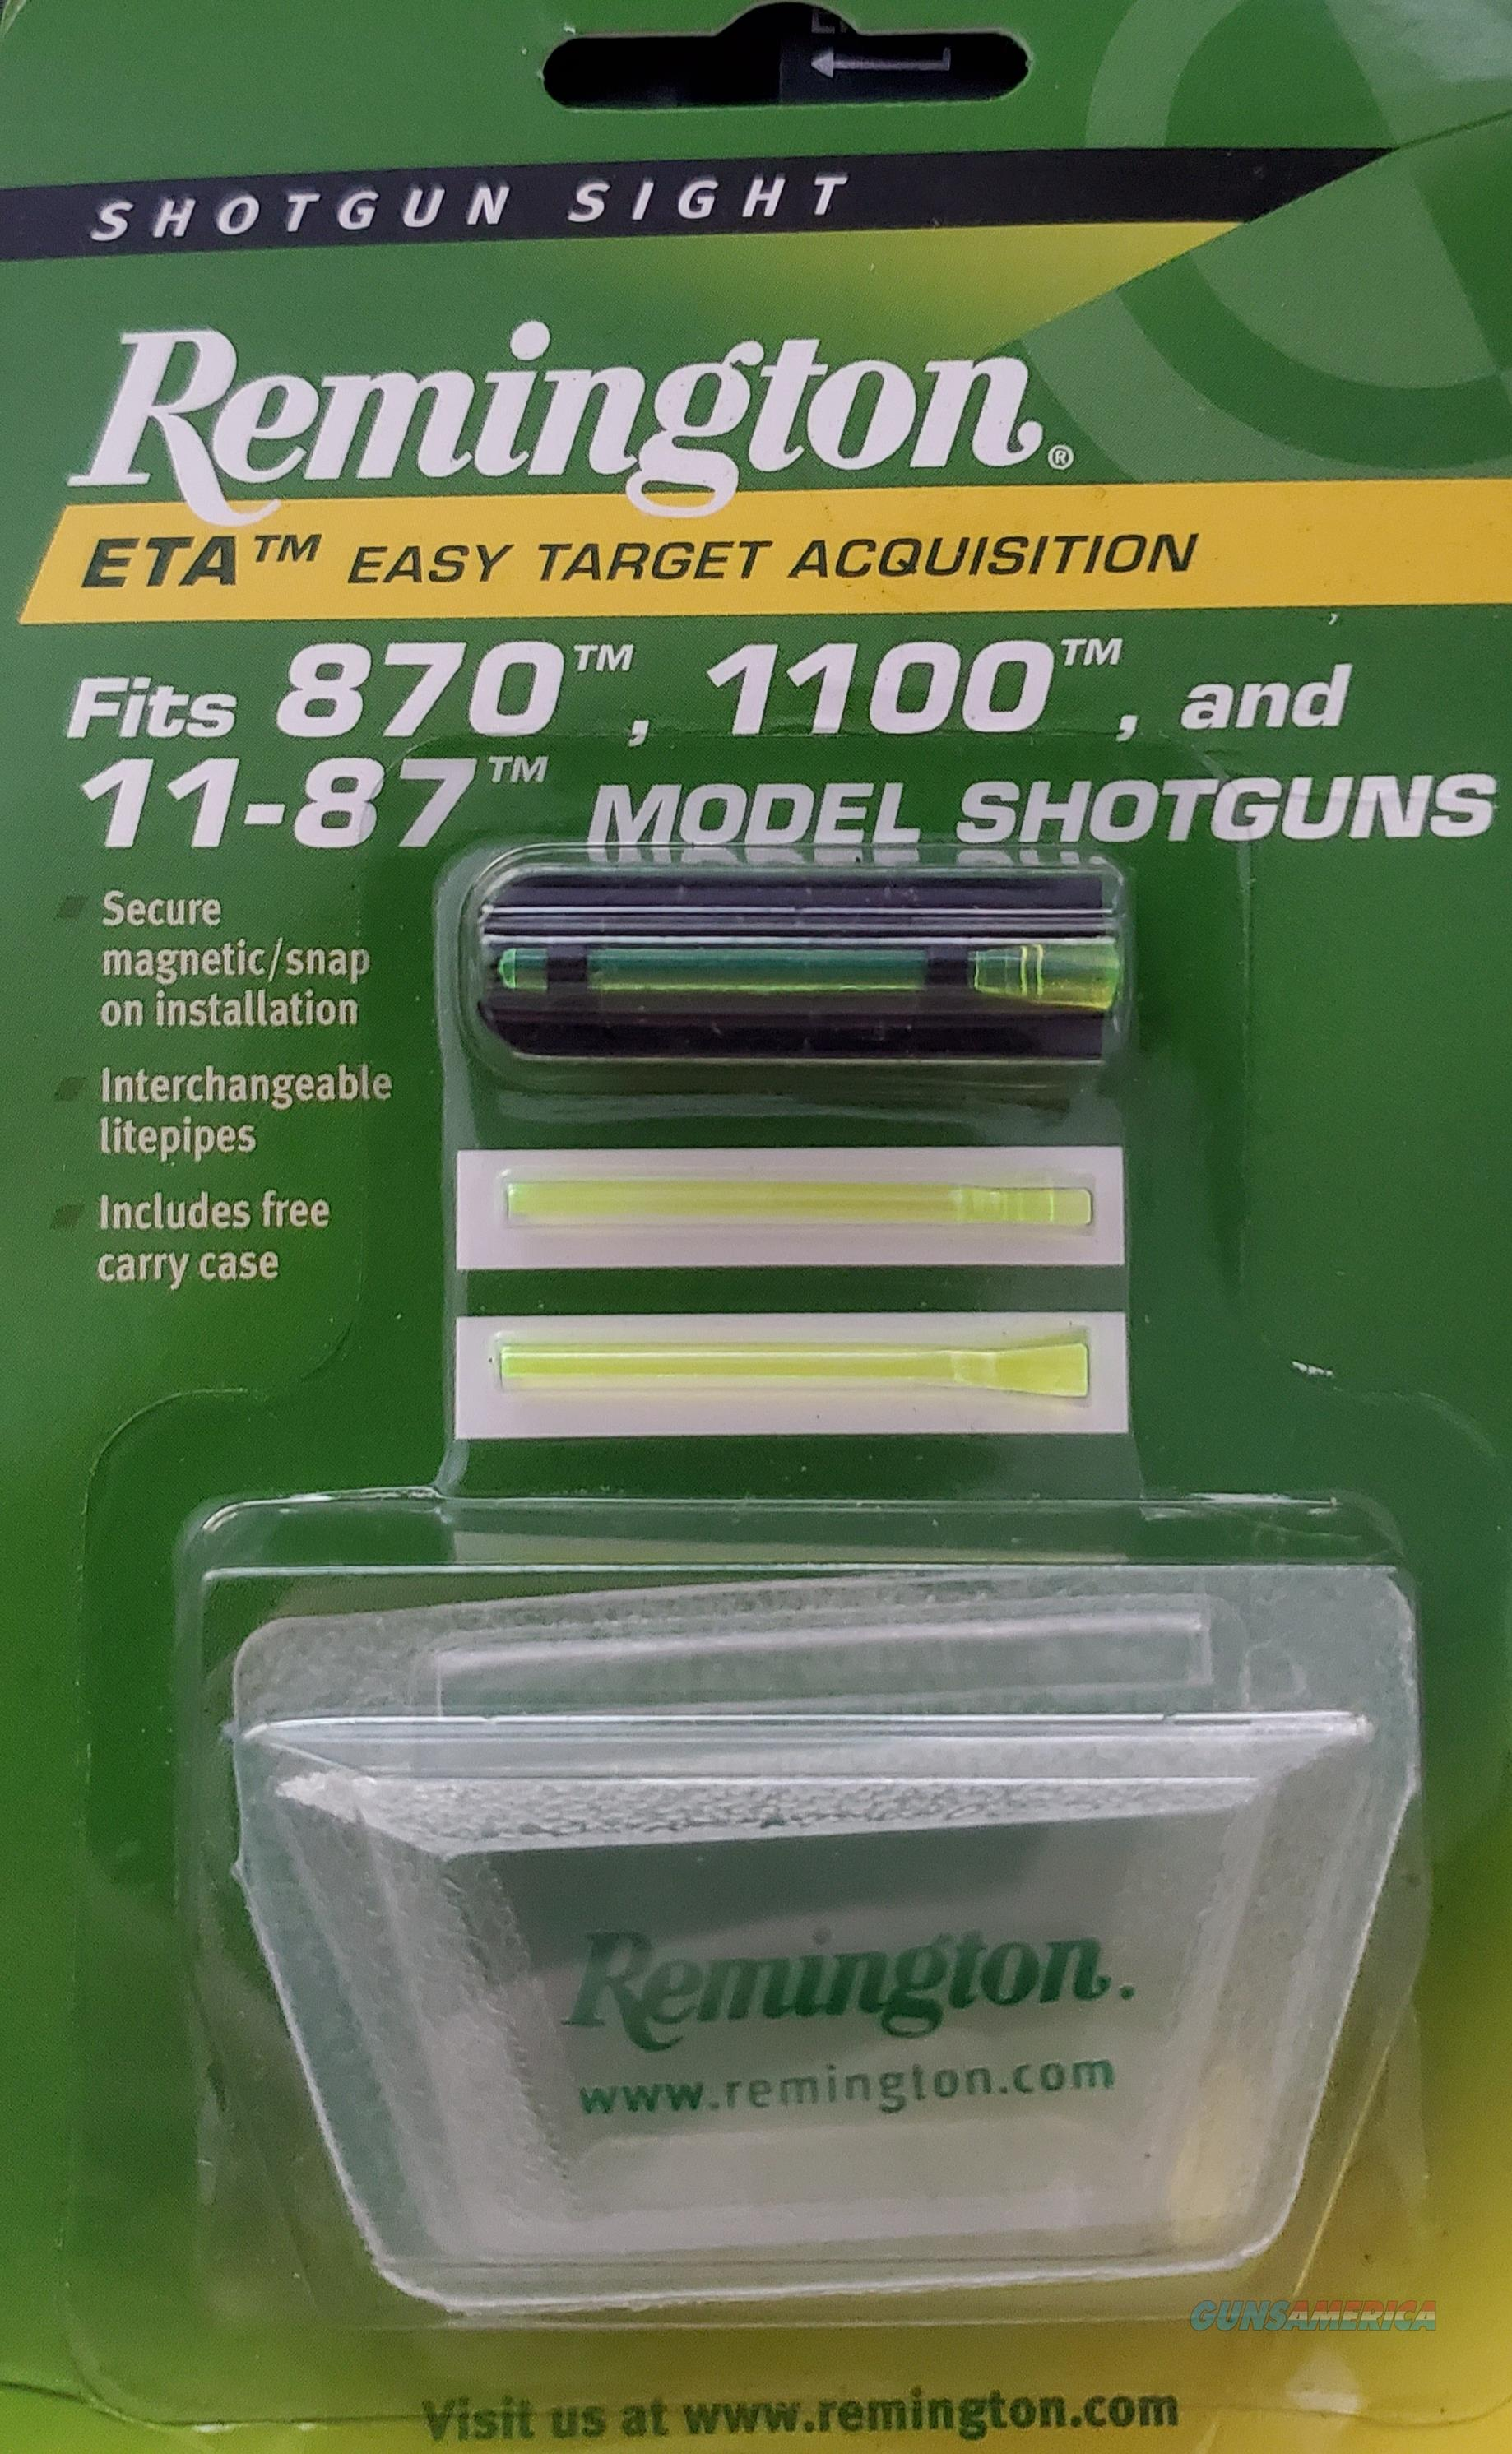 Remington ETA (Easy Target Acquisition) Shotgun Fiber Optic FRONT SIGHT  New!  Non-Guns > Gun Parts > Shotgun High Grade